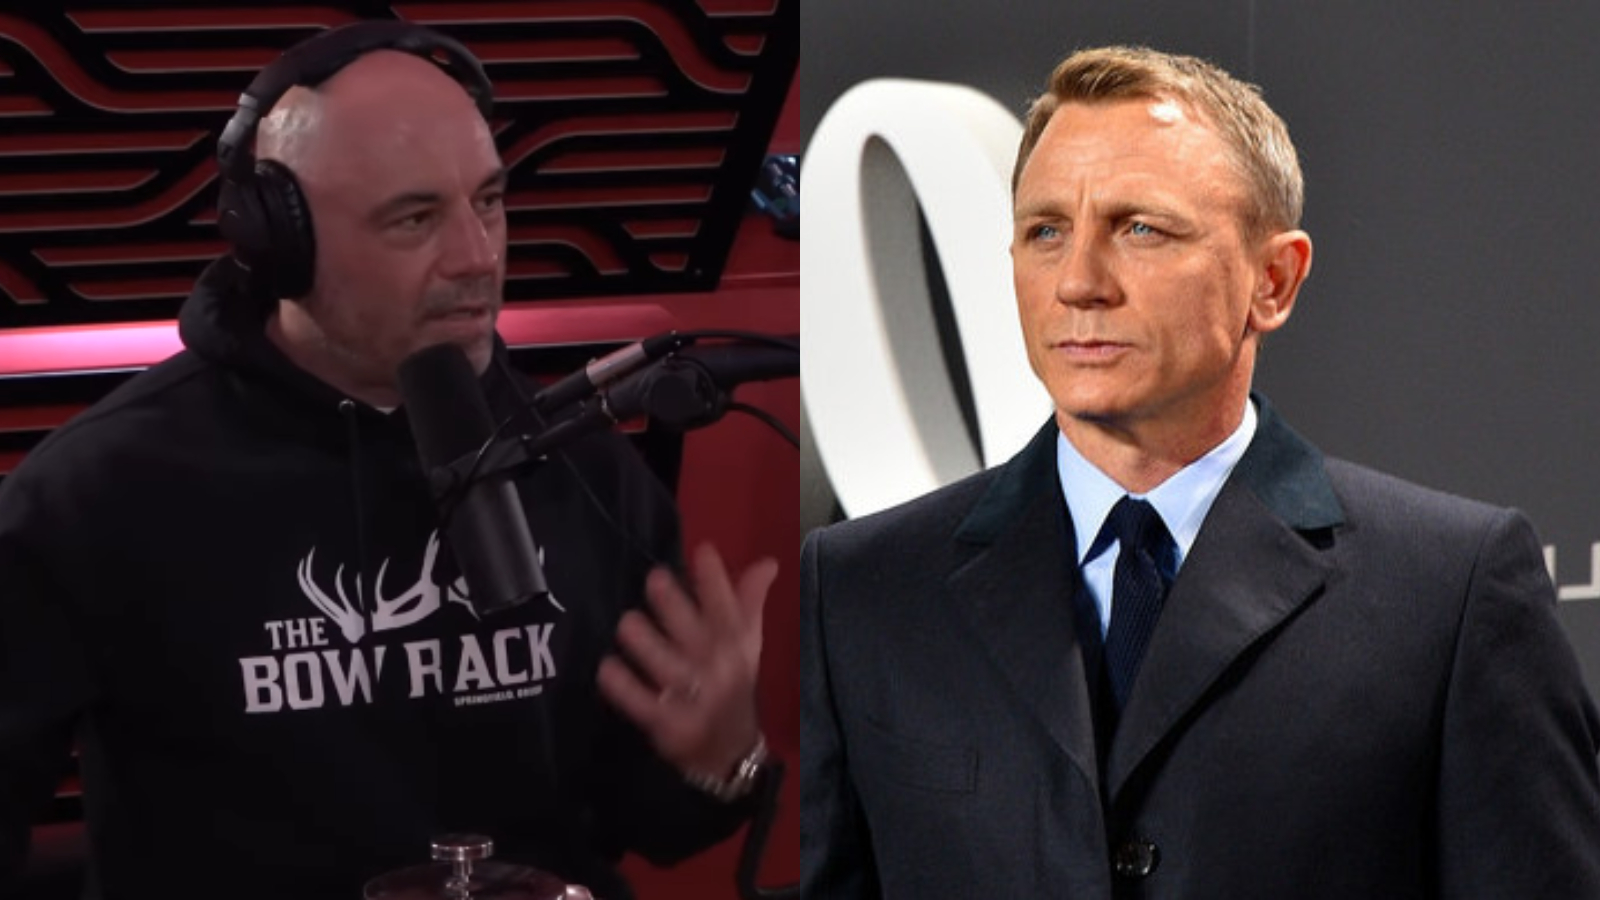 Joe Rogan says Daniel Craig is the best 007.